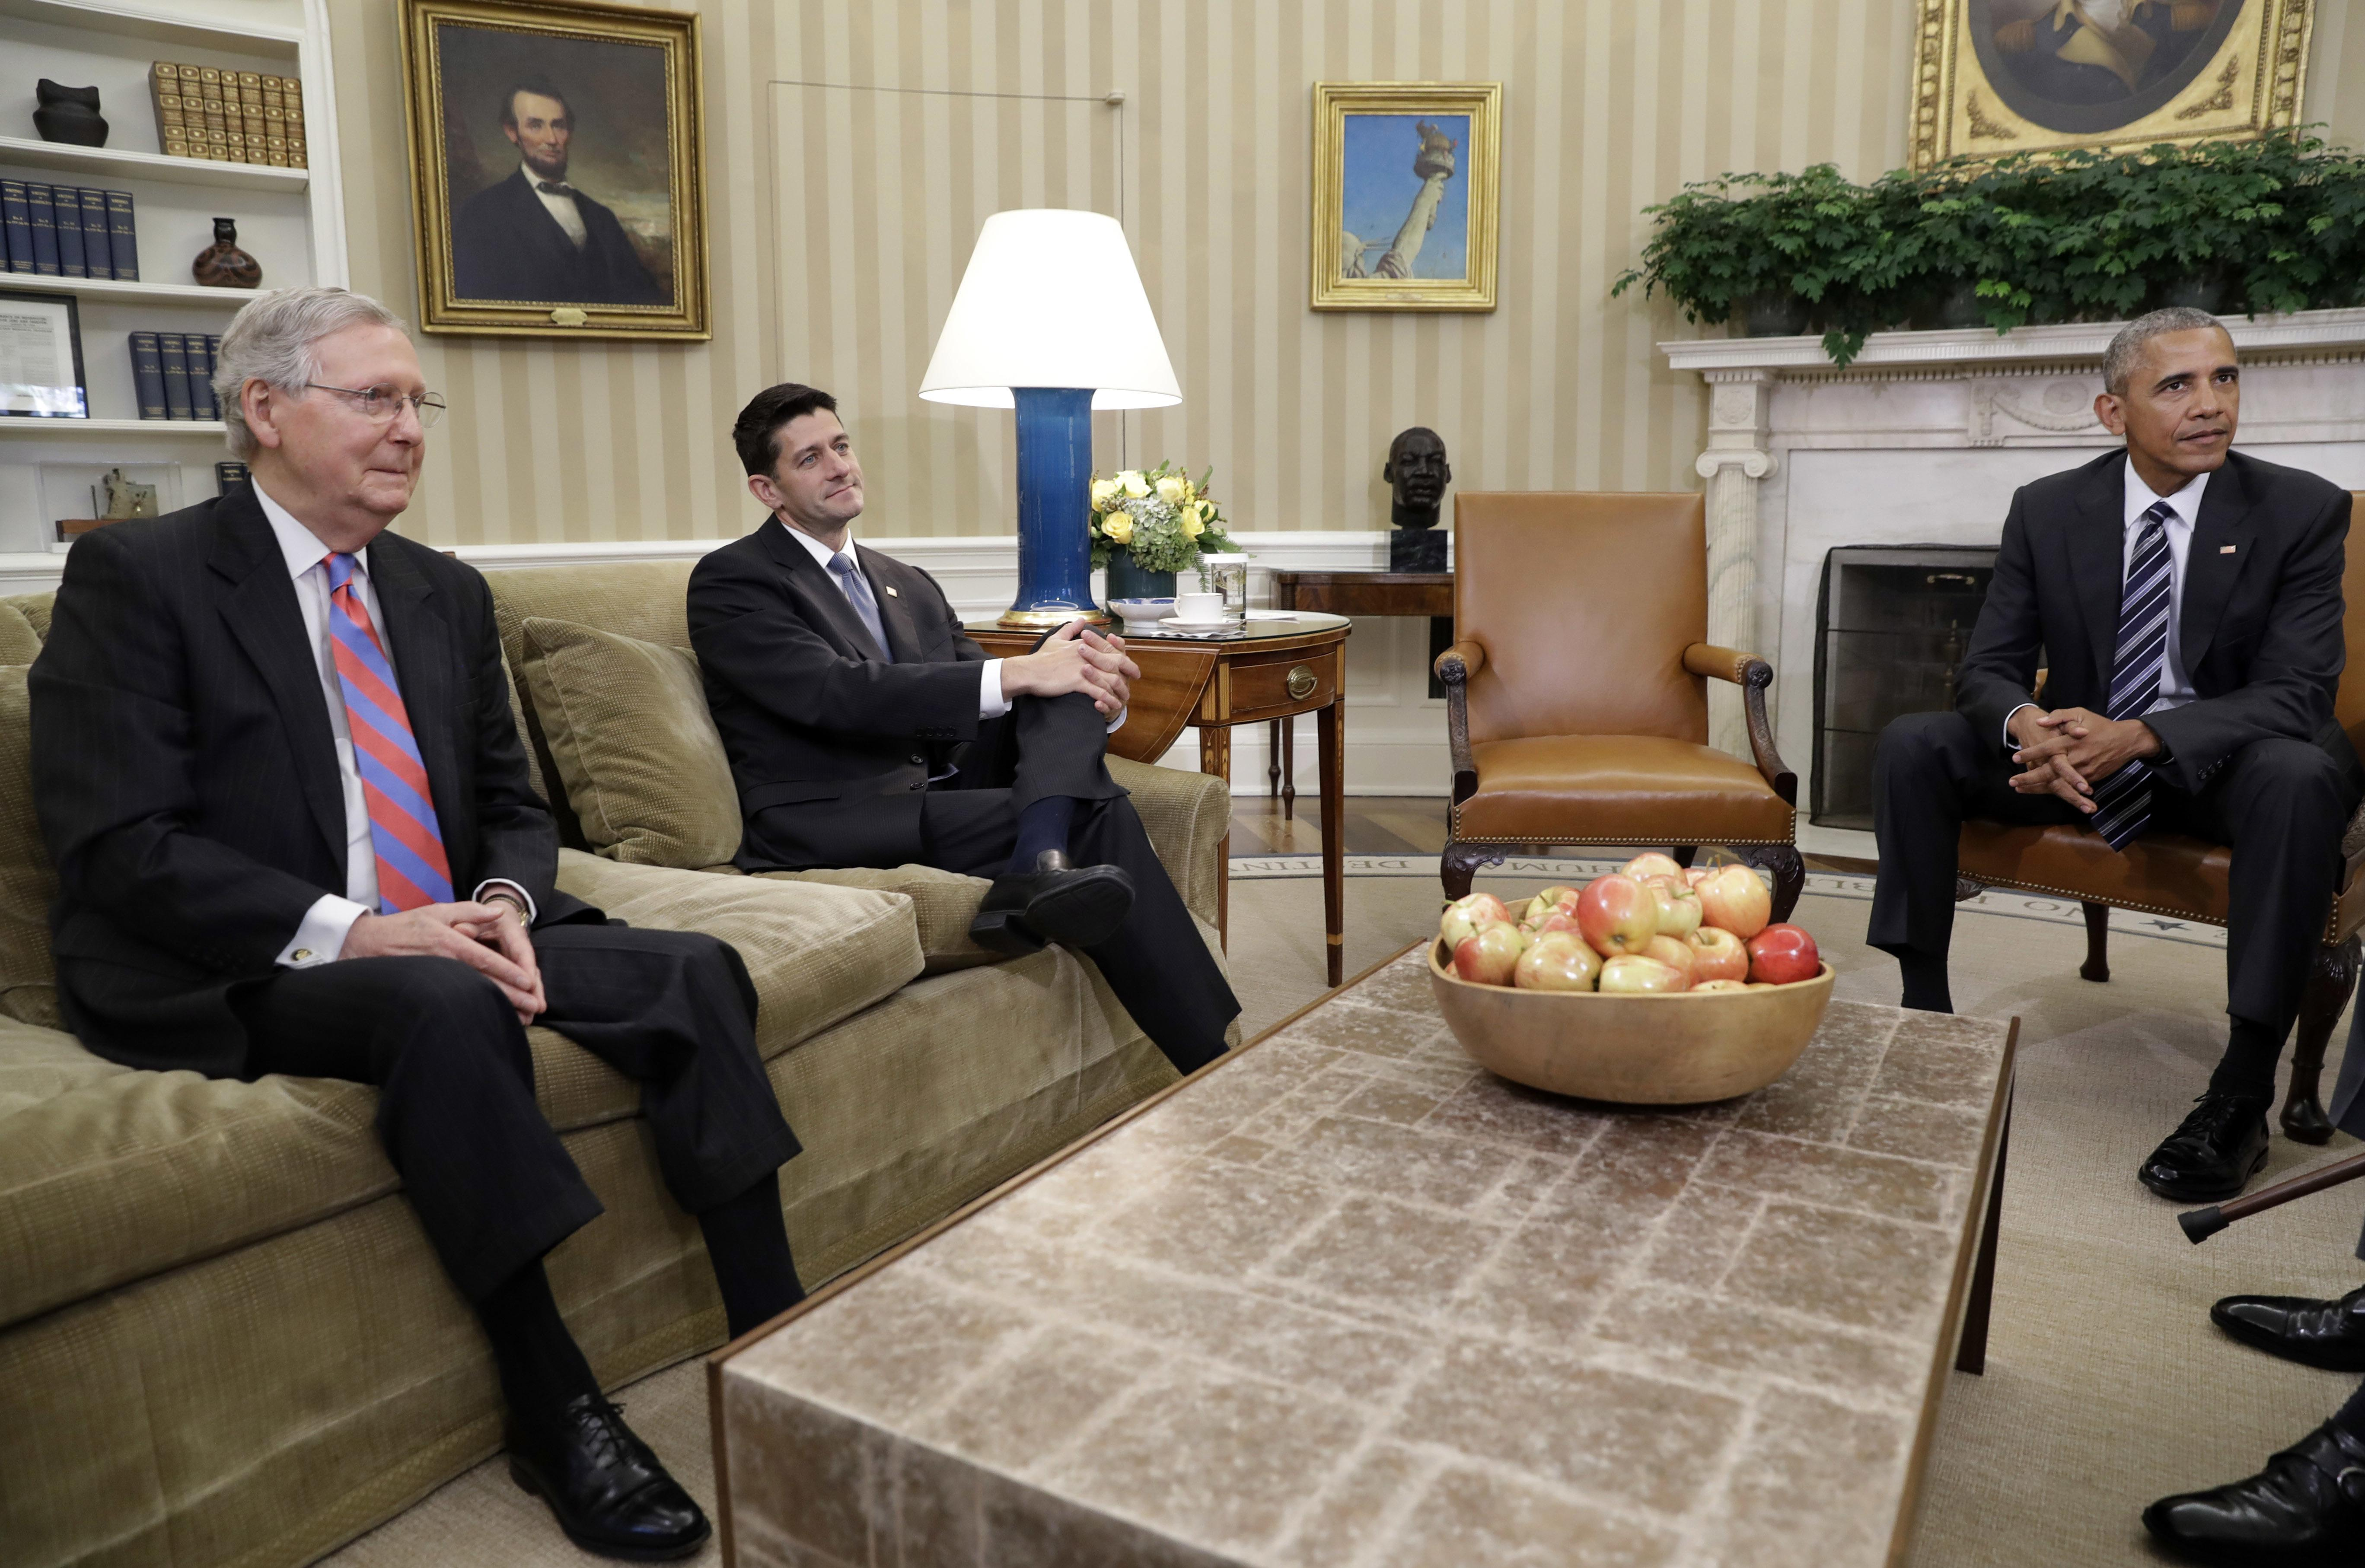 Obama, McConnell strike hopeful tone on budget, Zika   The